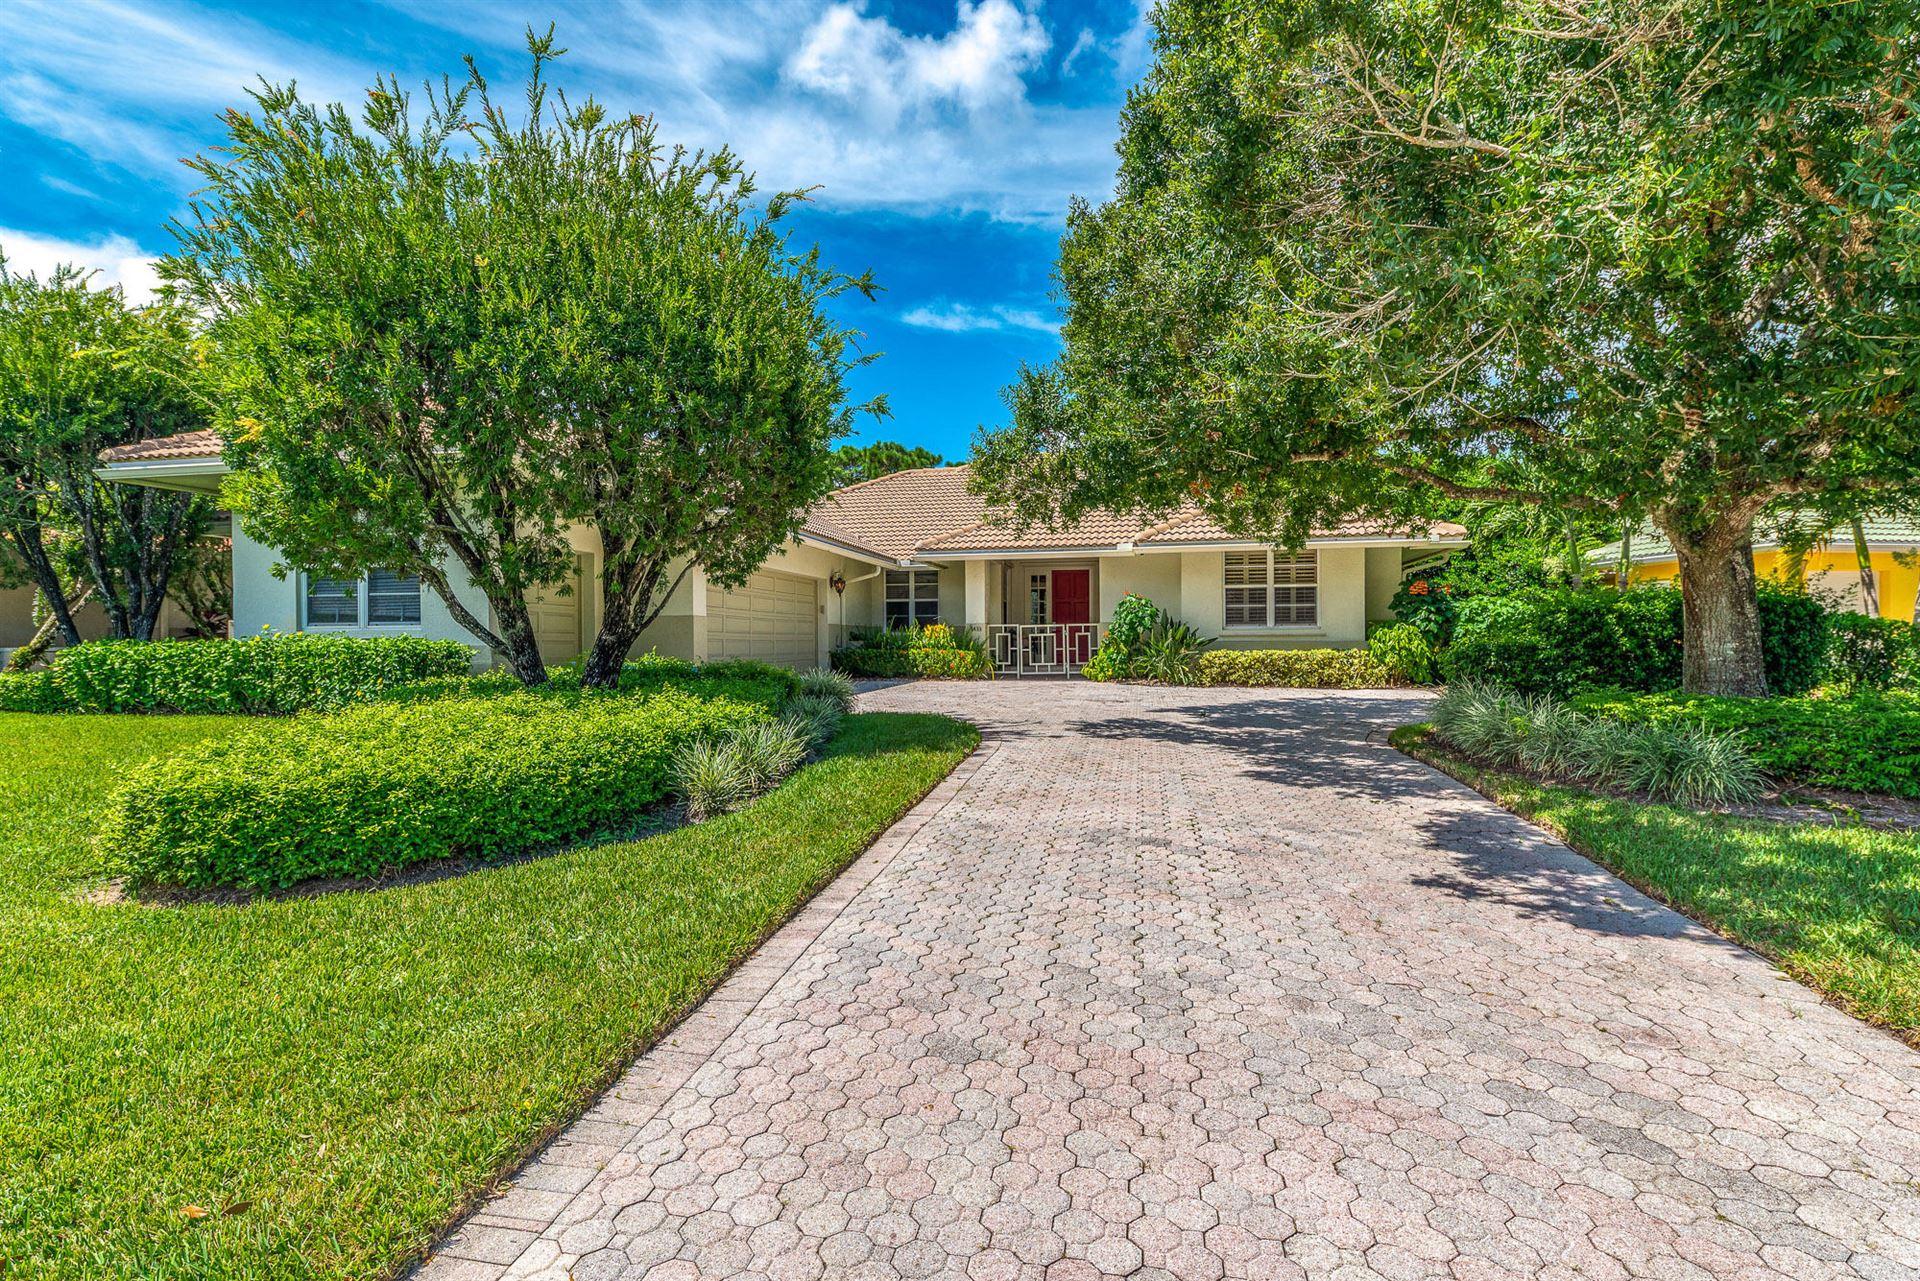 1433 SE Brewster Place, Stuart, FL 34997 - #: RX-10658241